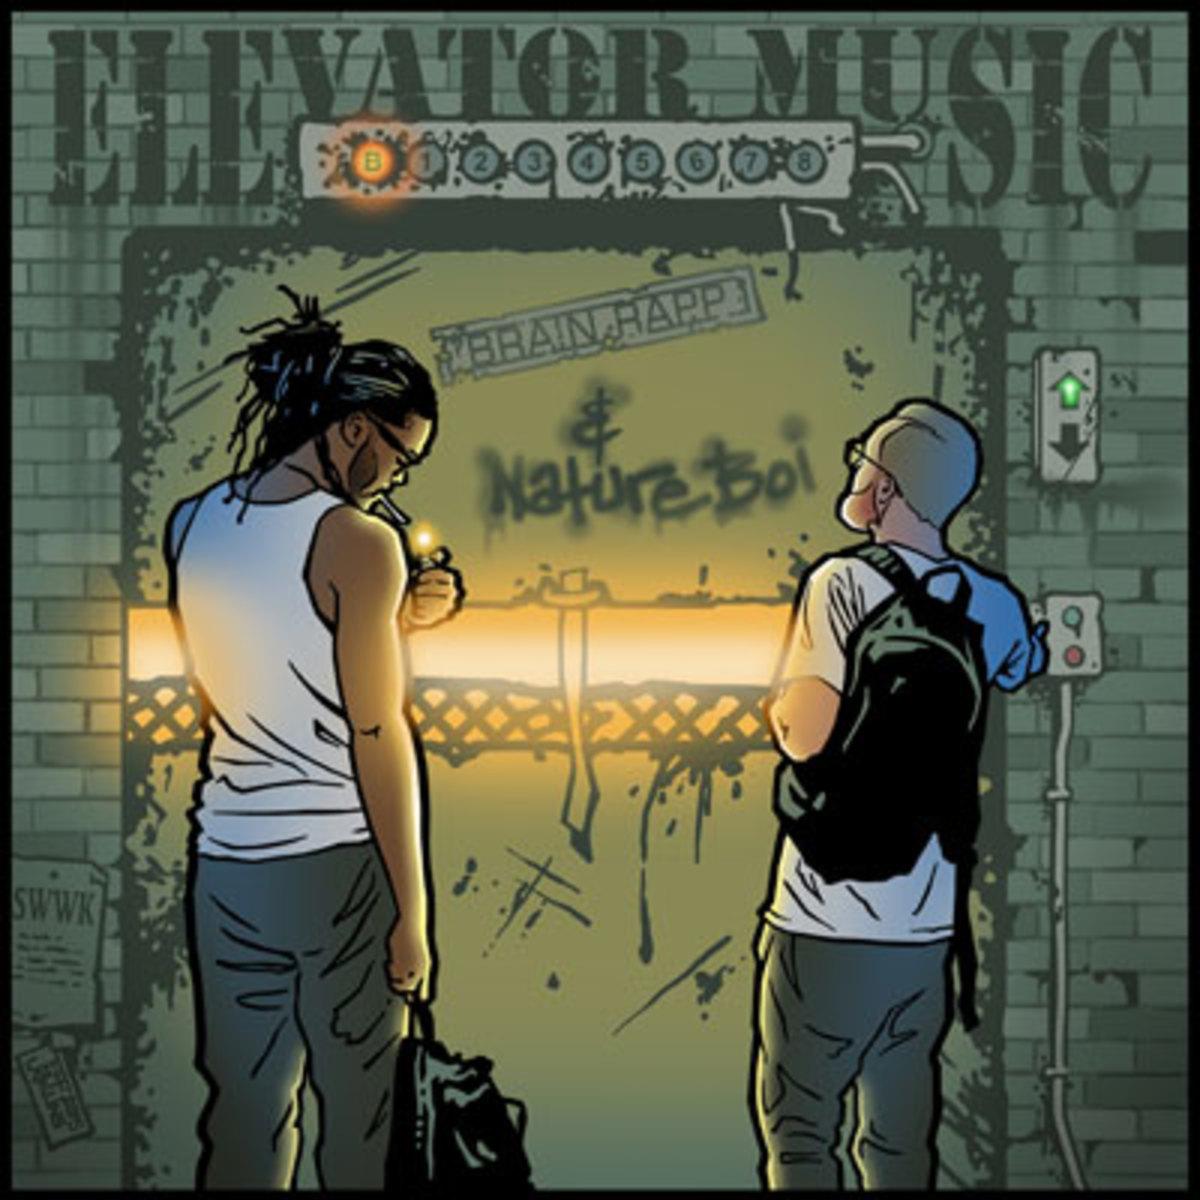 brain-rapp-elevator-music.jpg